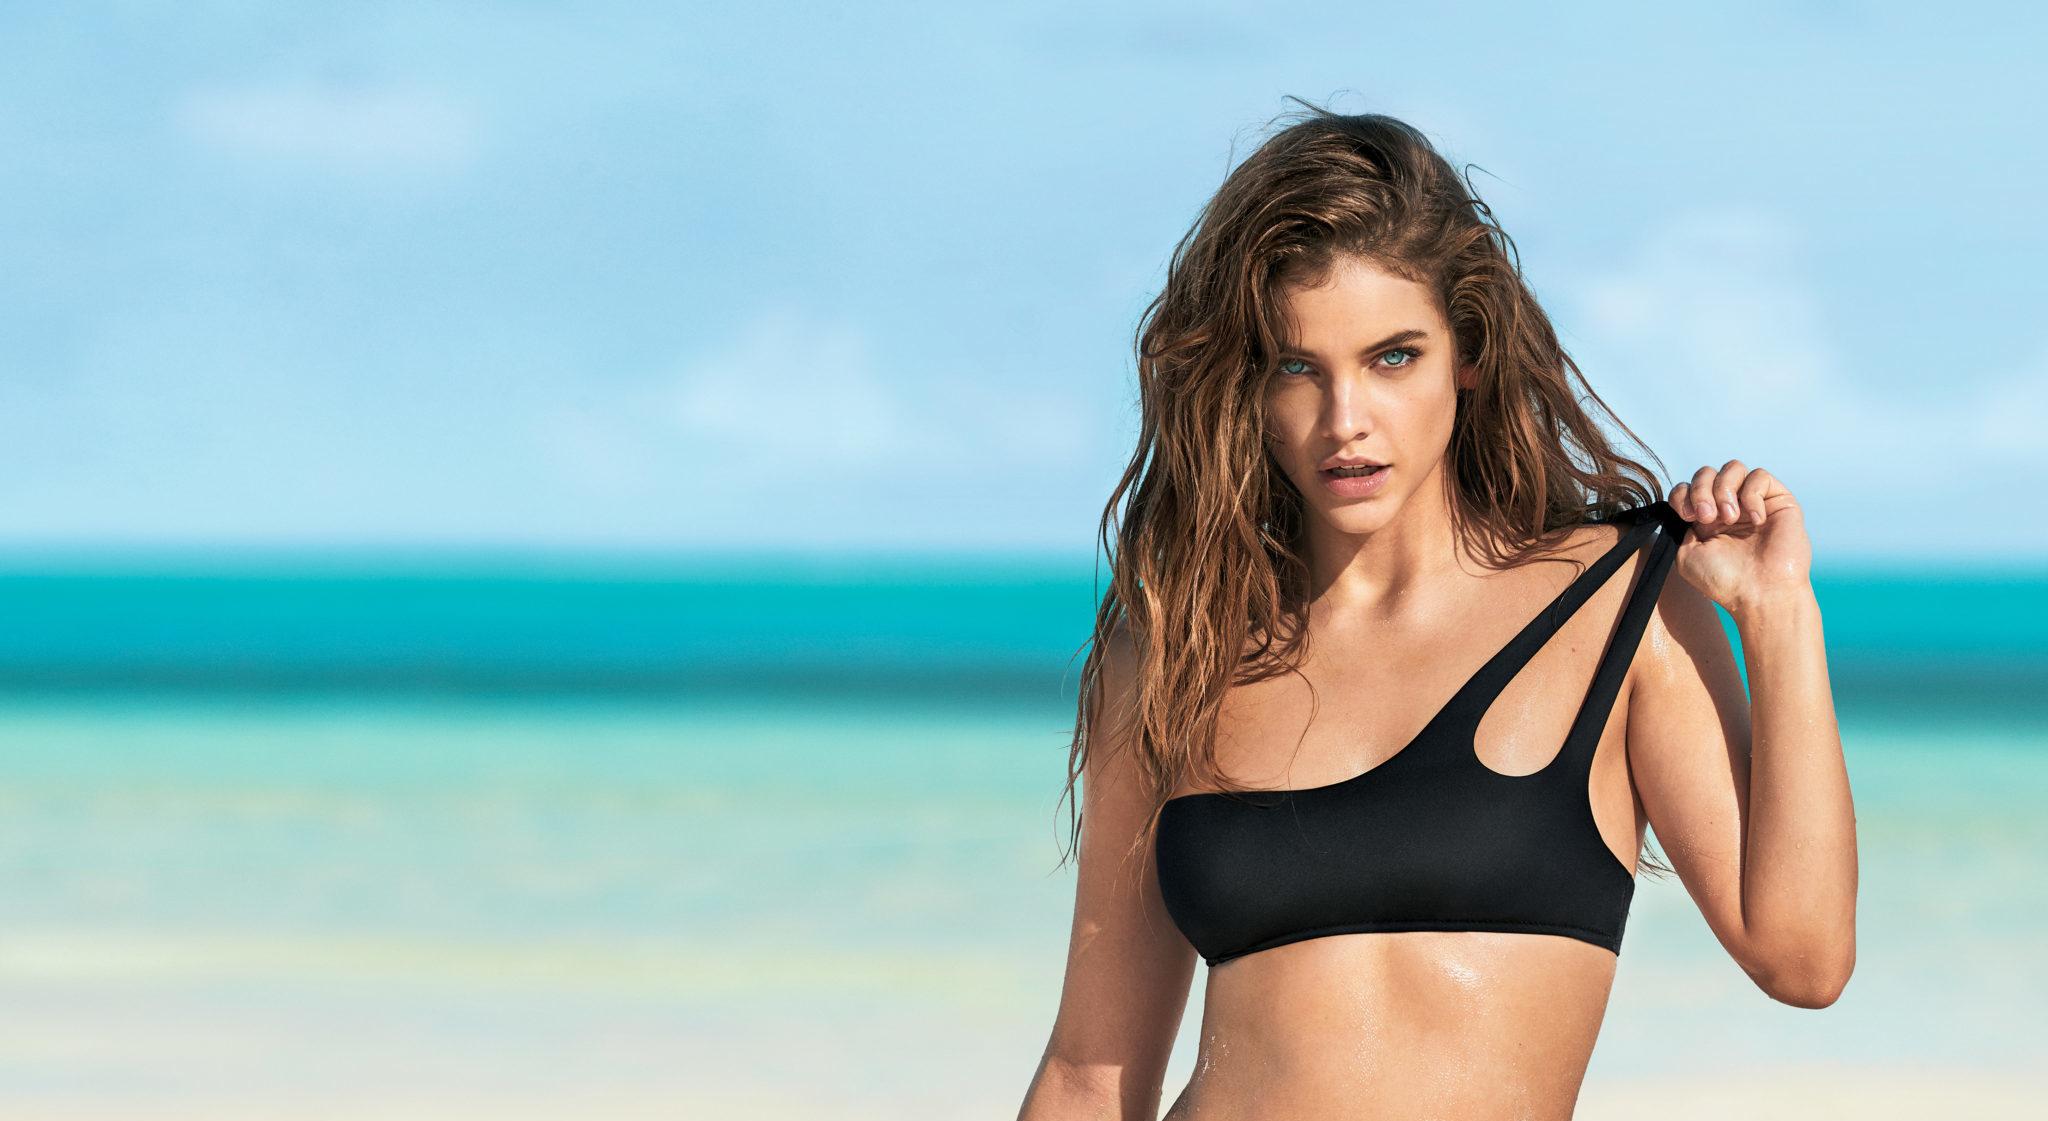 06622eafce3 11 beachwear trends για να είσαι η θεά της παραλίας - ELLE